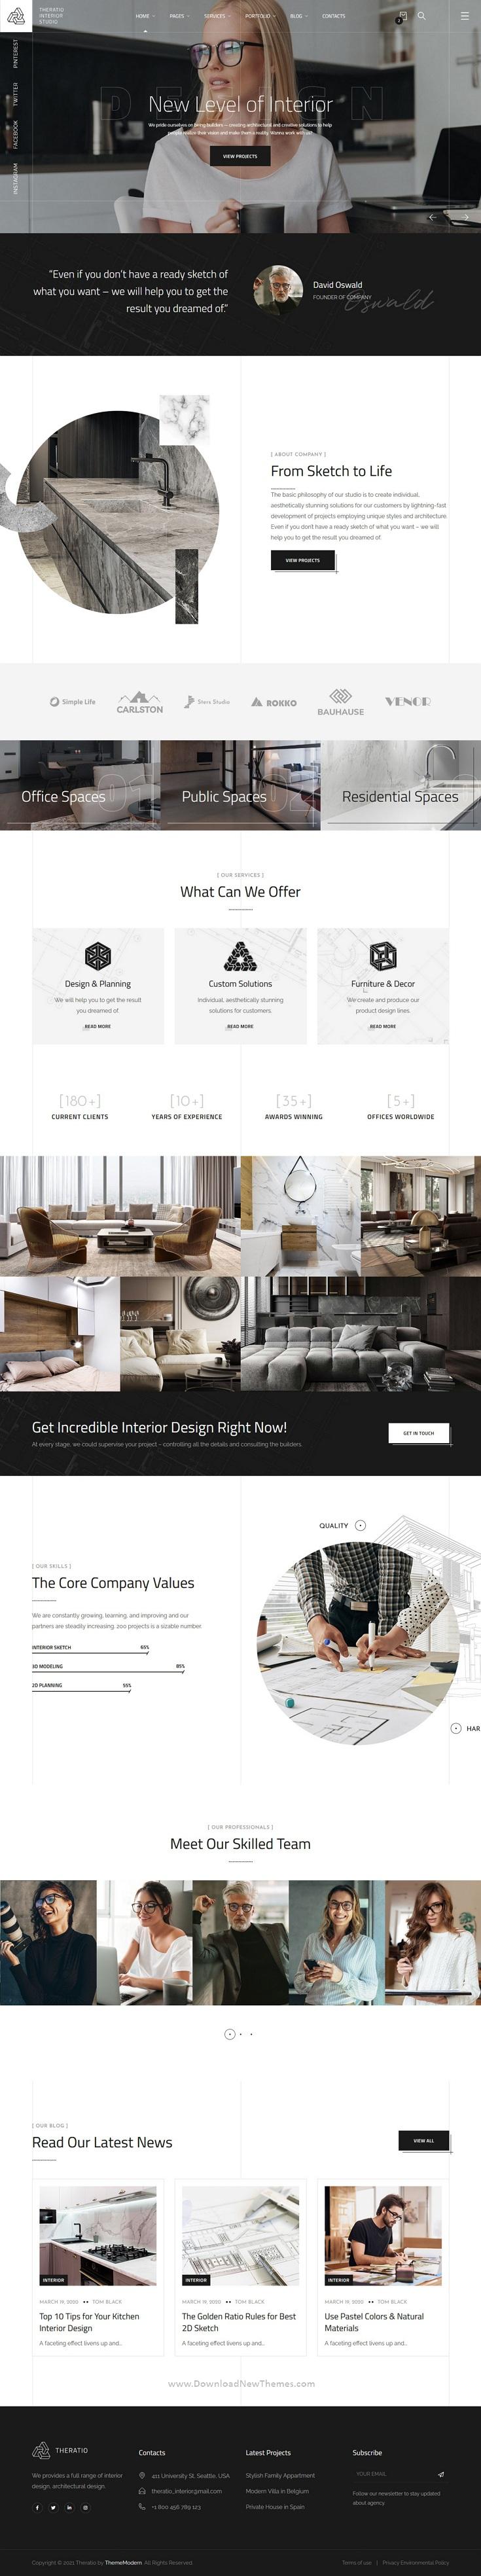 Interior Design and Architecture HTML5 Template